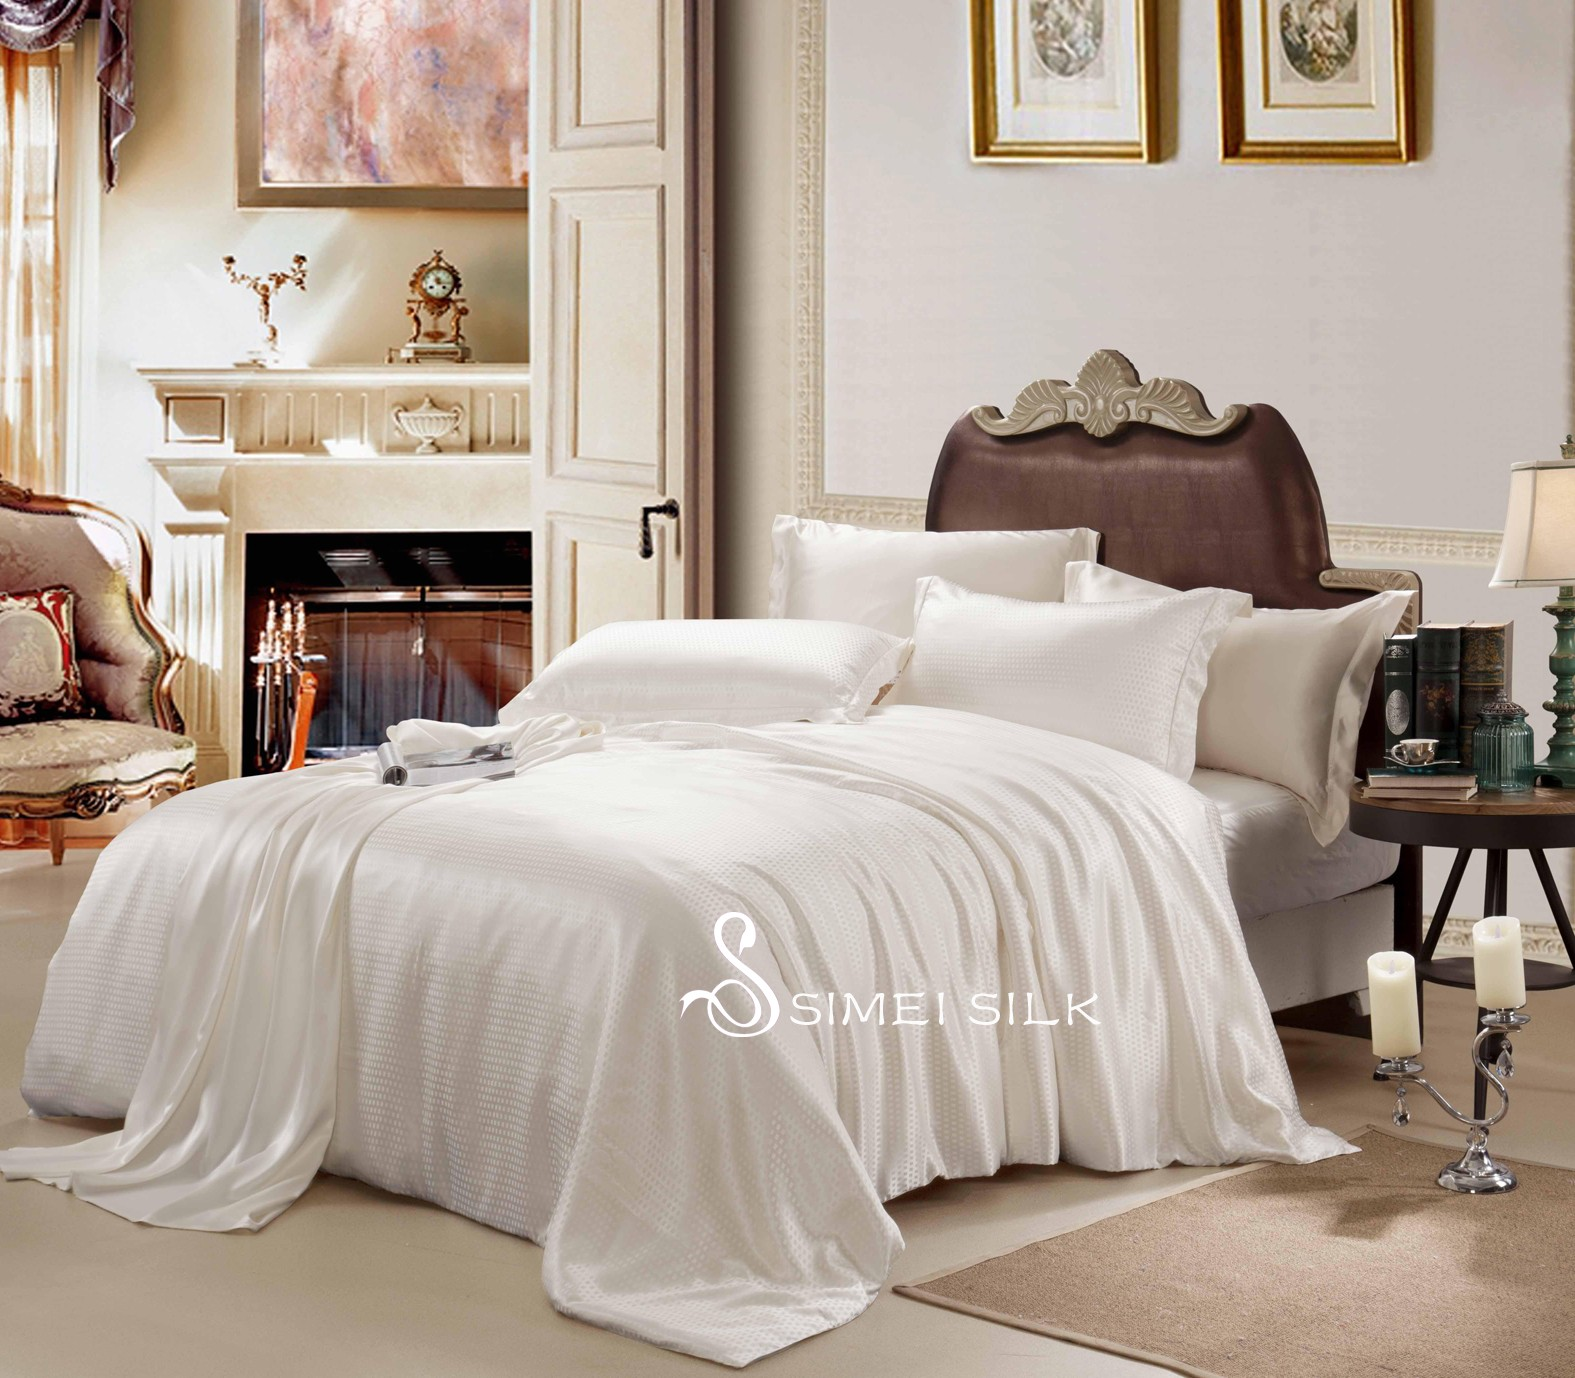 silk bedding sets ( 4pcs king size, white-square)